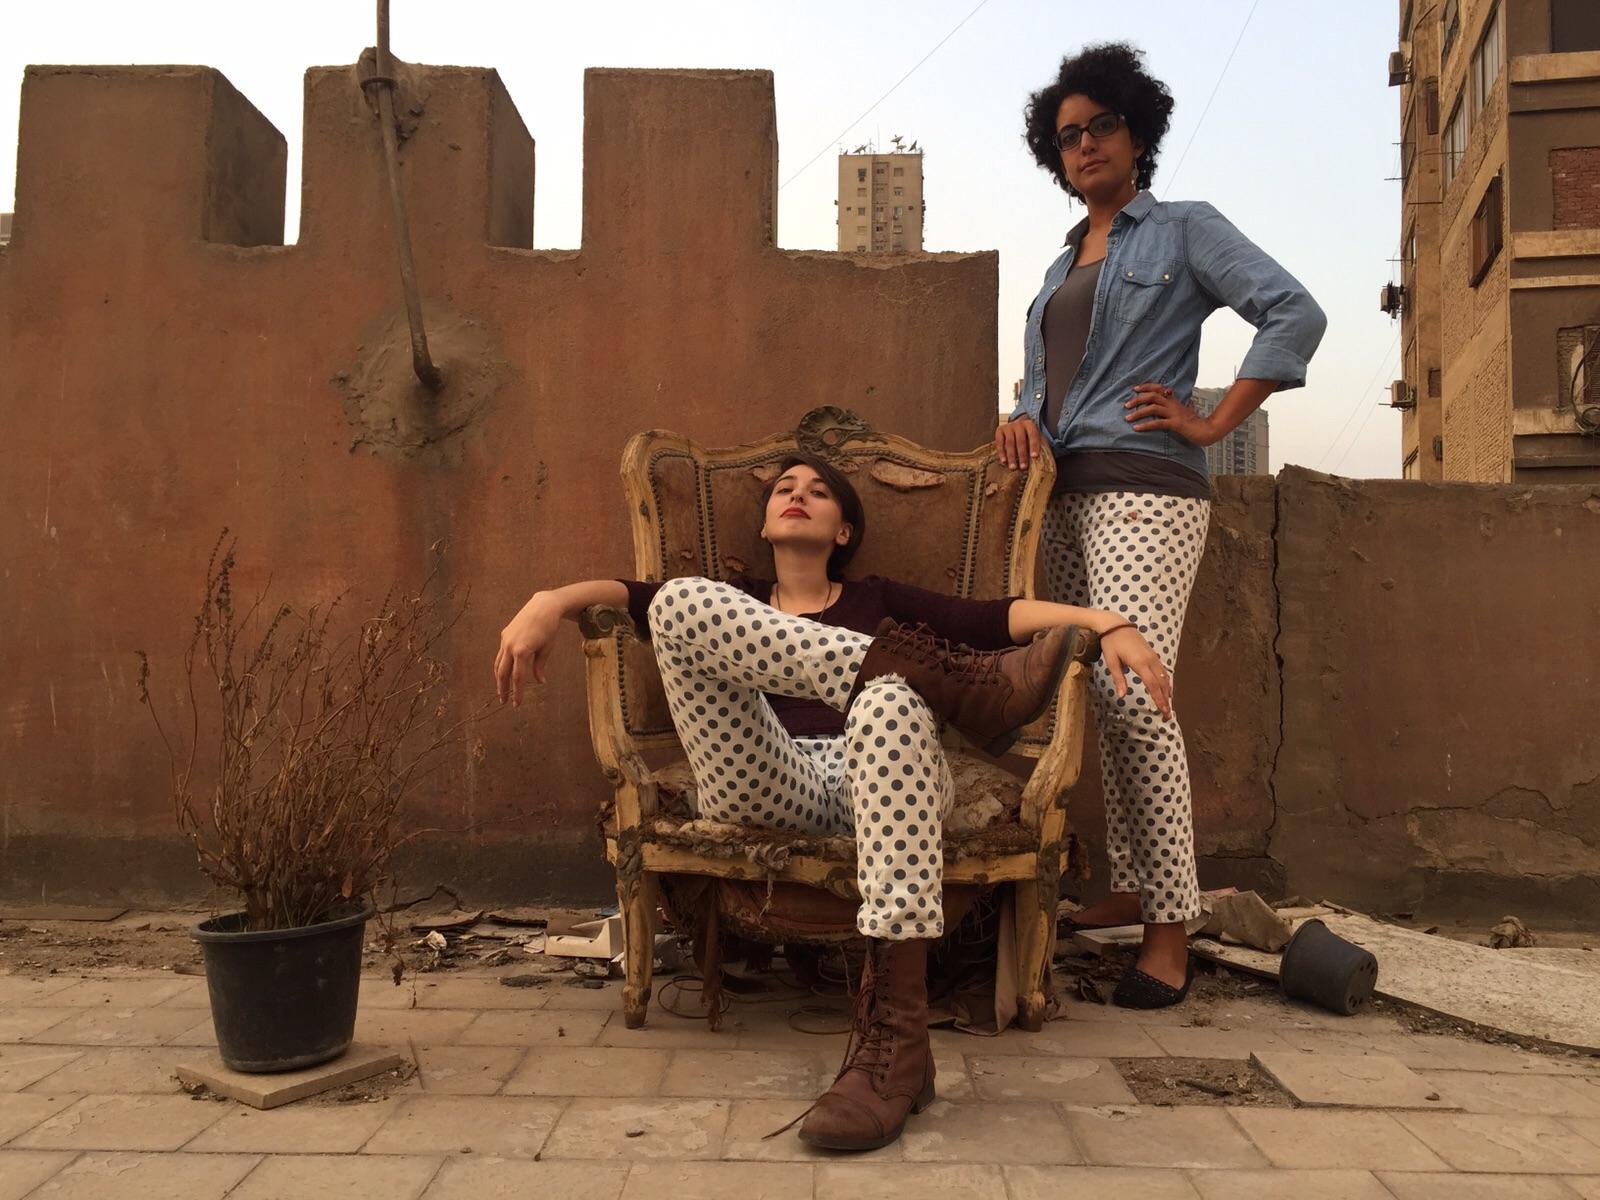 Heba and Pesha in their matching pants